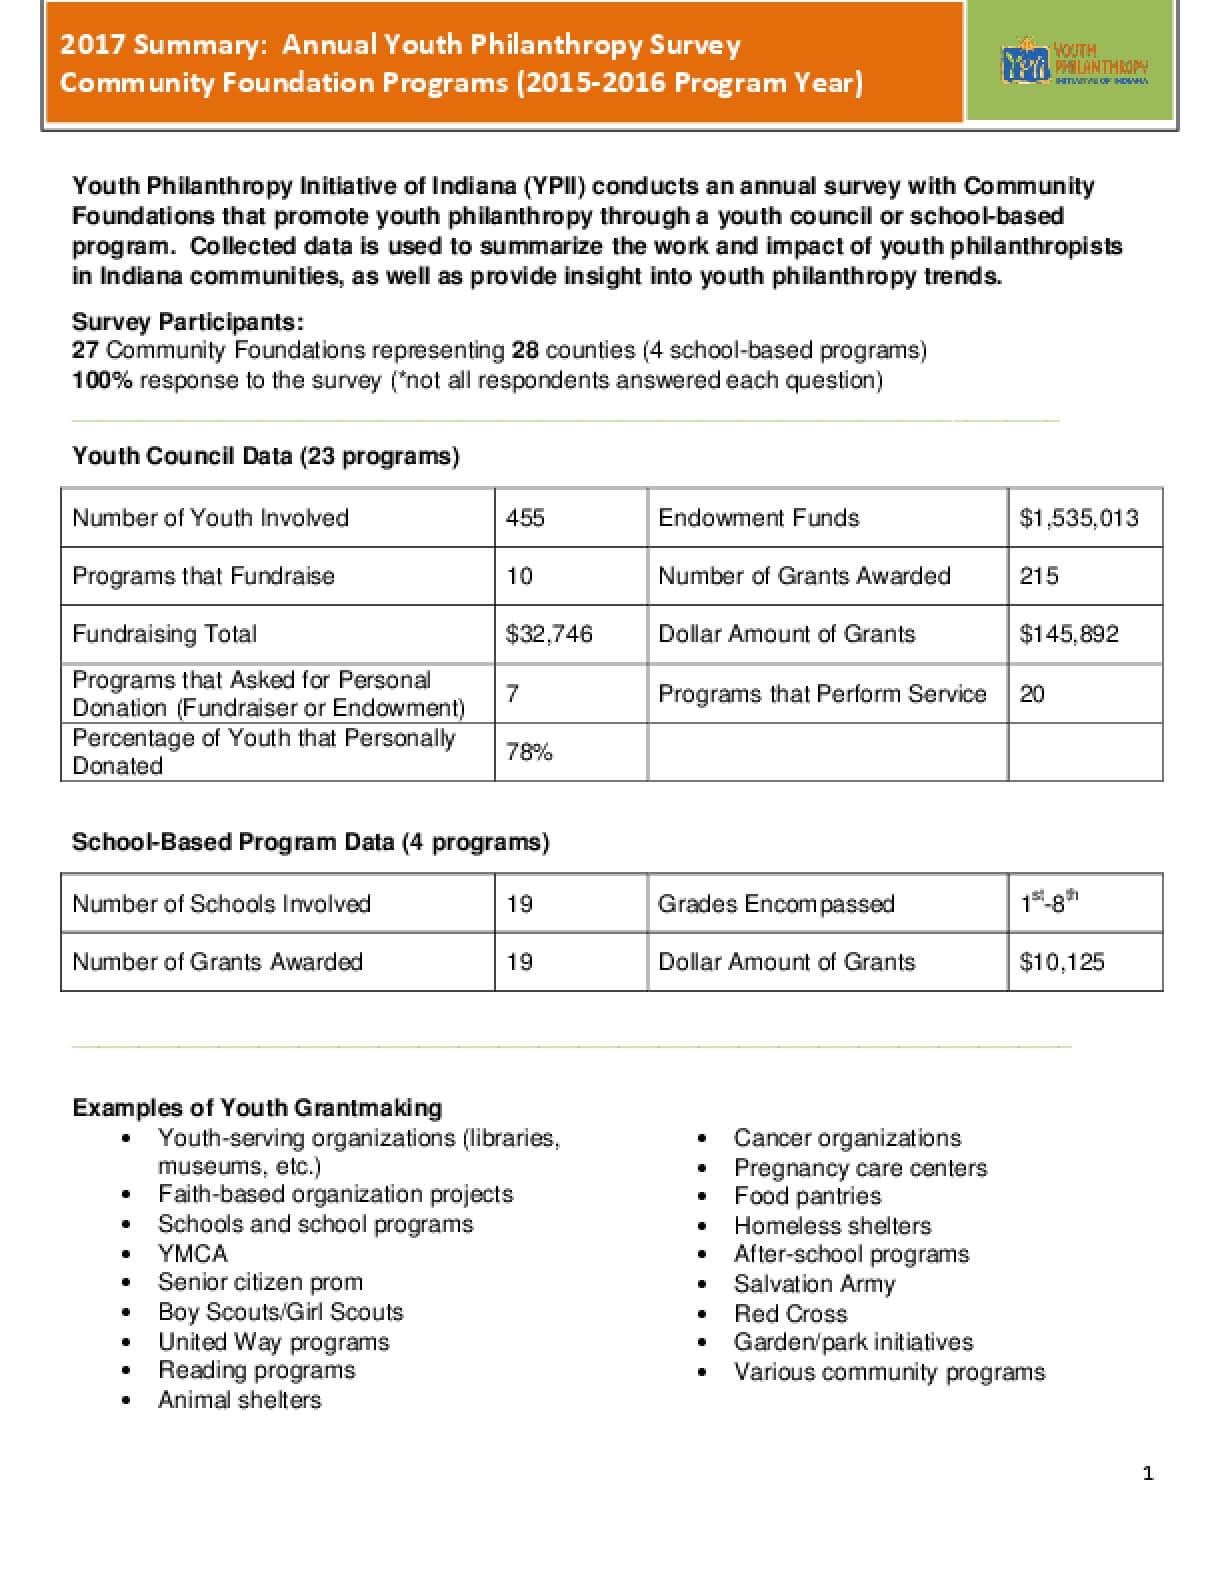 2017 Summary: Annual Youth Philanthropy Survey Community Foundation Programs (2015-2016 Program Year)